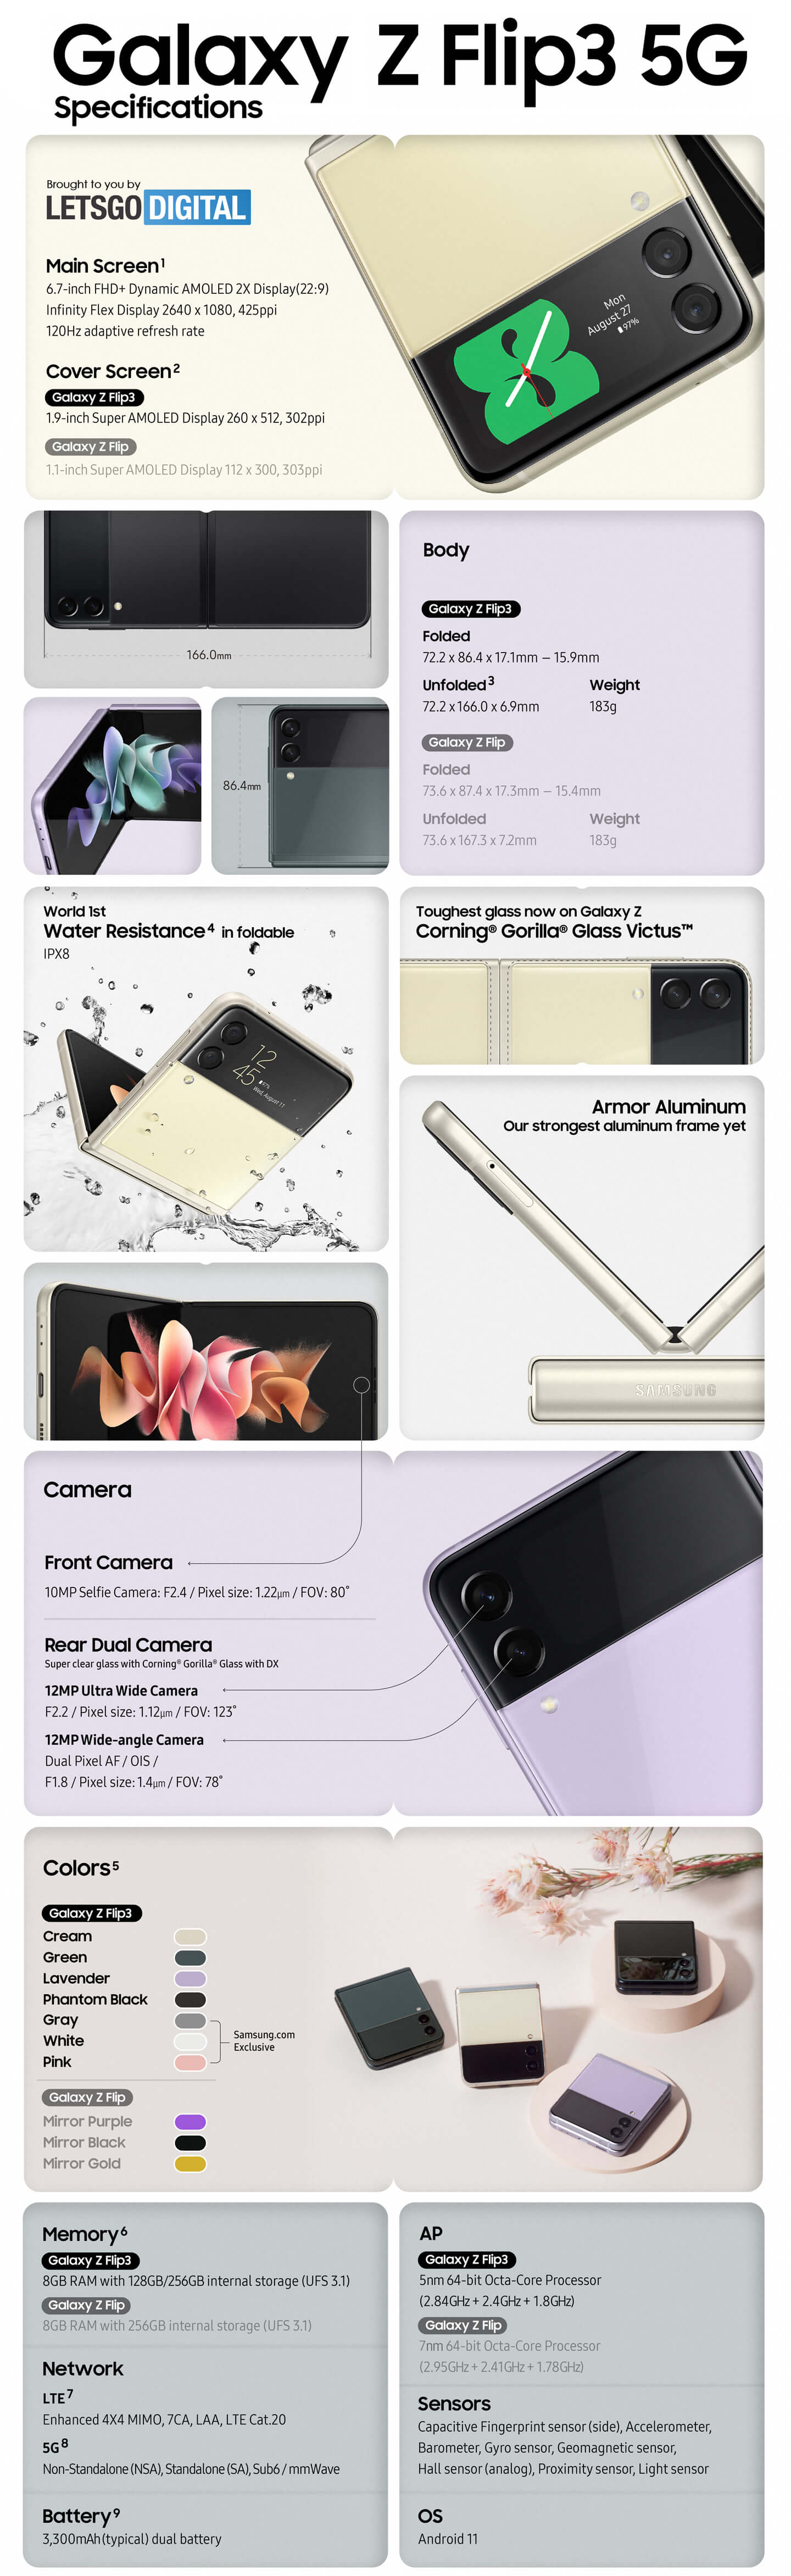 Galaxy Z Flip 3 specs